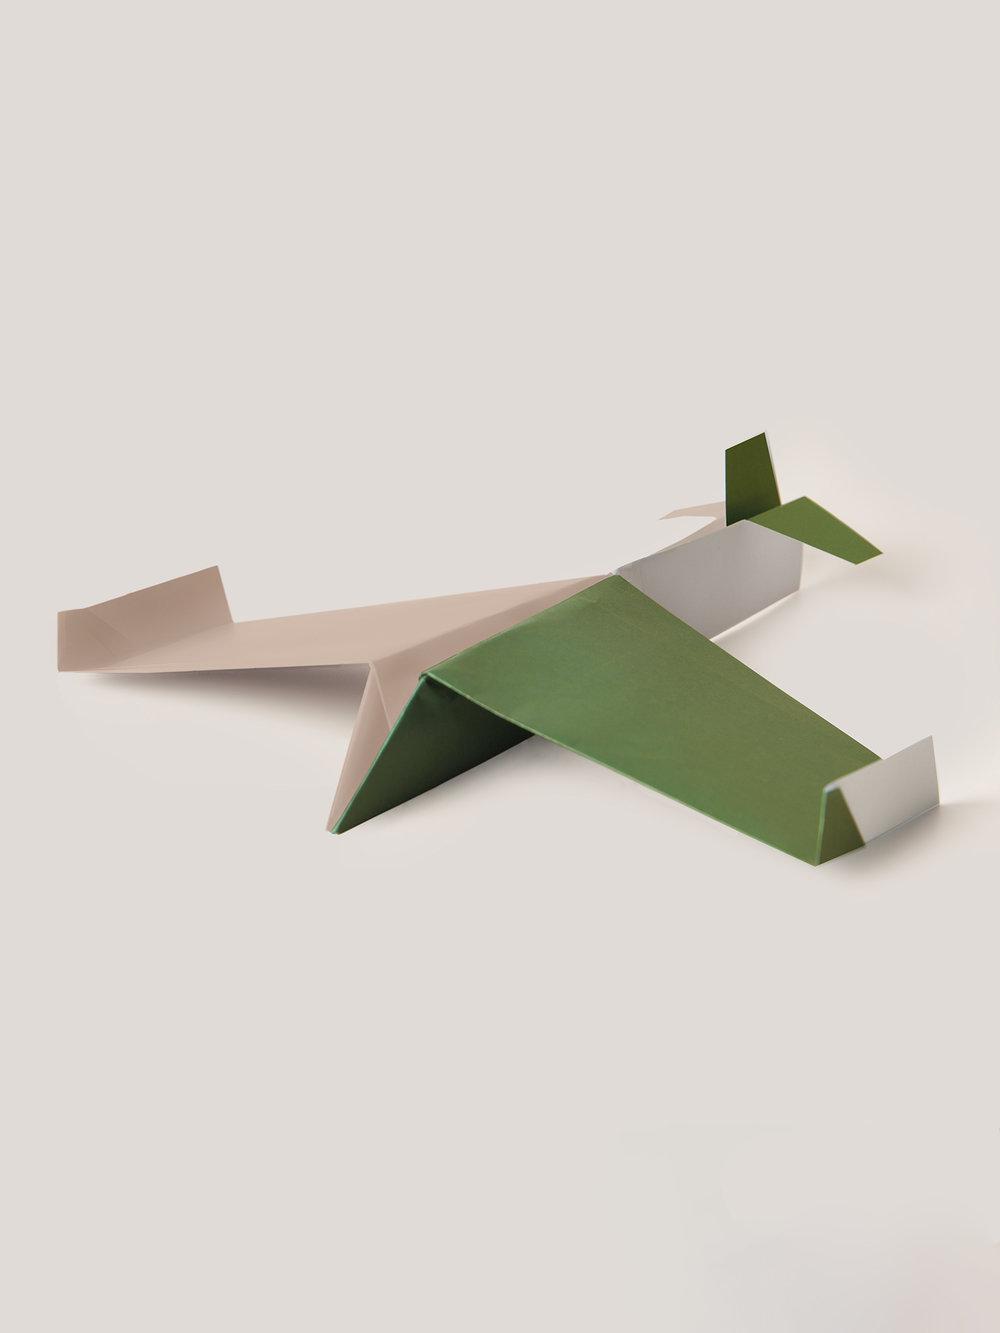 Origami Figur Papierflieger, mehrfarbig  Origami figure Paper airplane, multicolored